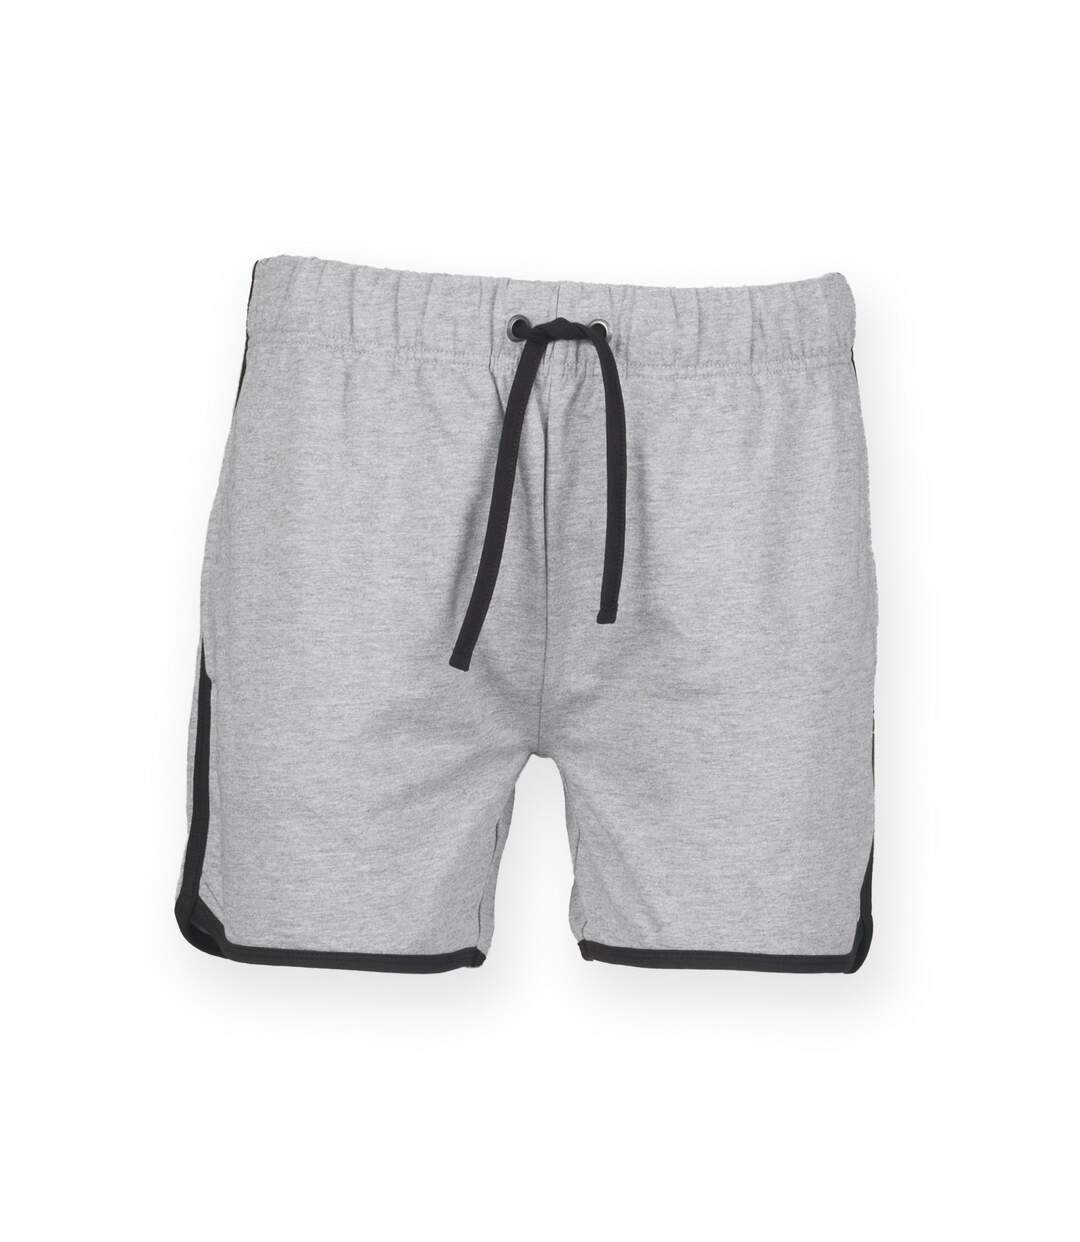 Skinnifit Mens Retro Training Fitness Shorts (Heather Grey / Black) - UTRW4749